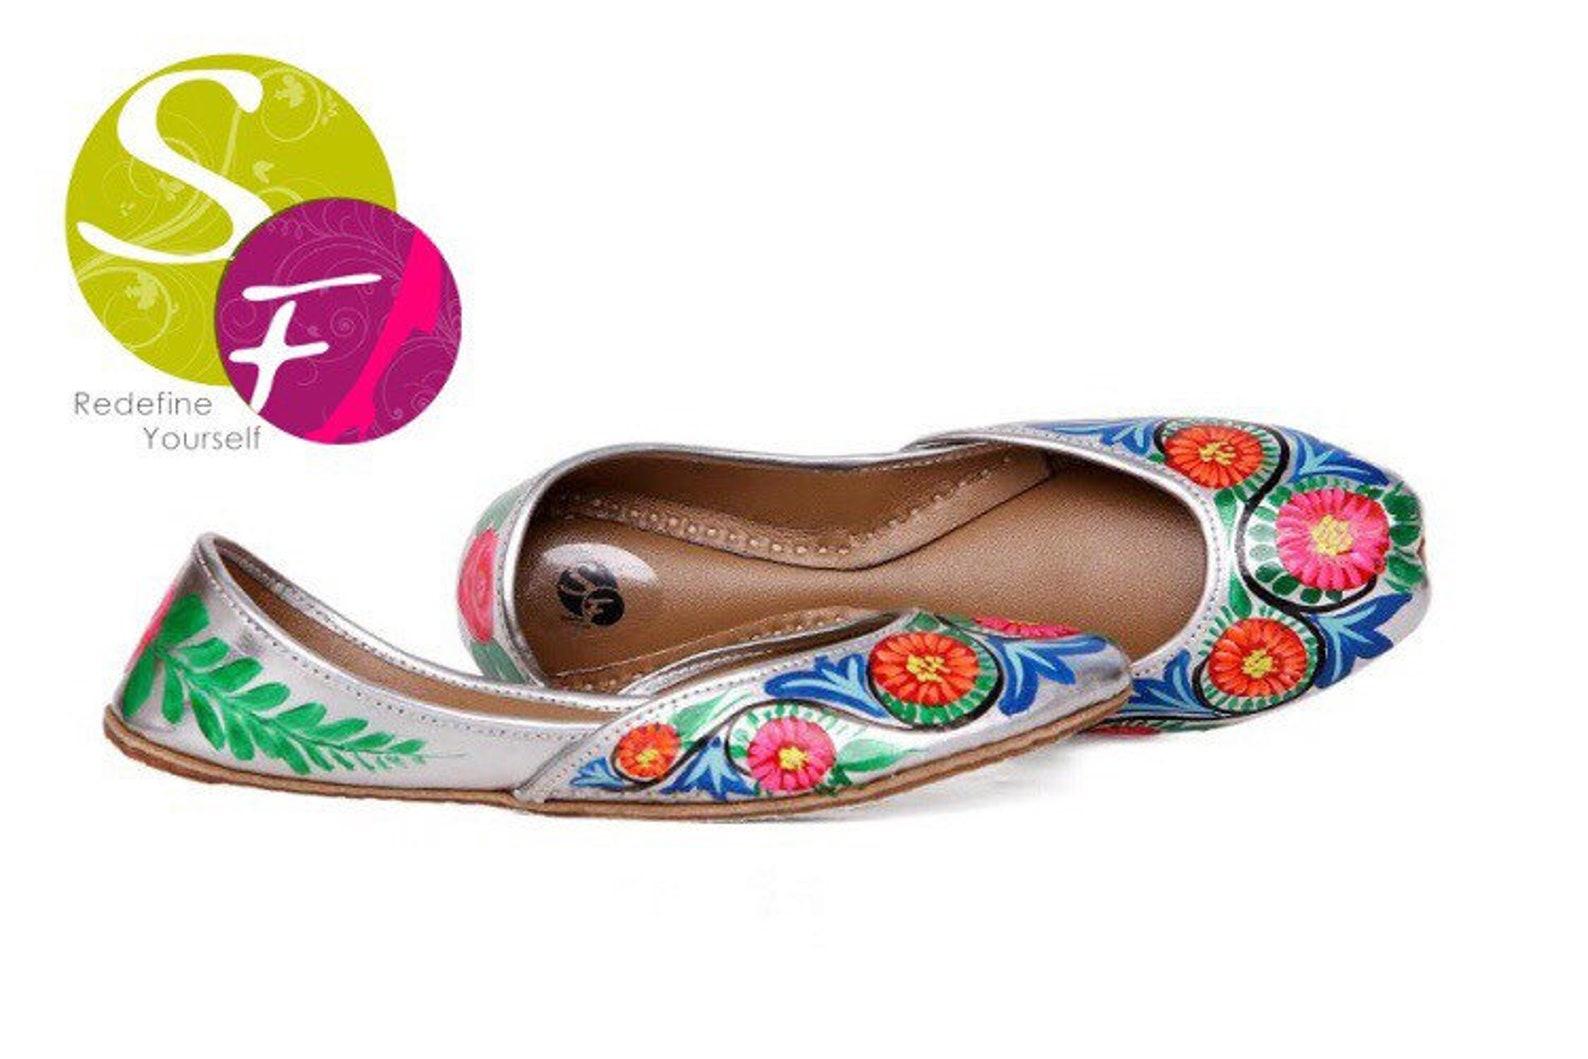 truck art handpainted women flat shoes ballet flats handpainted khussa juti ethnic painted shoes handpainted mojari indian jutti